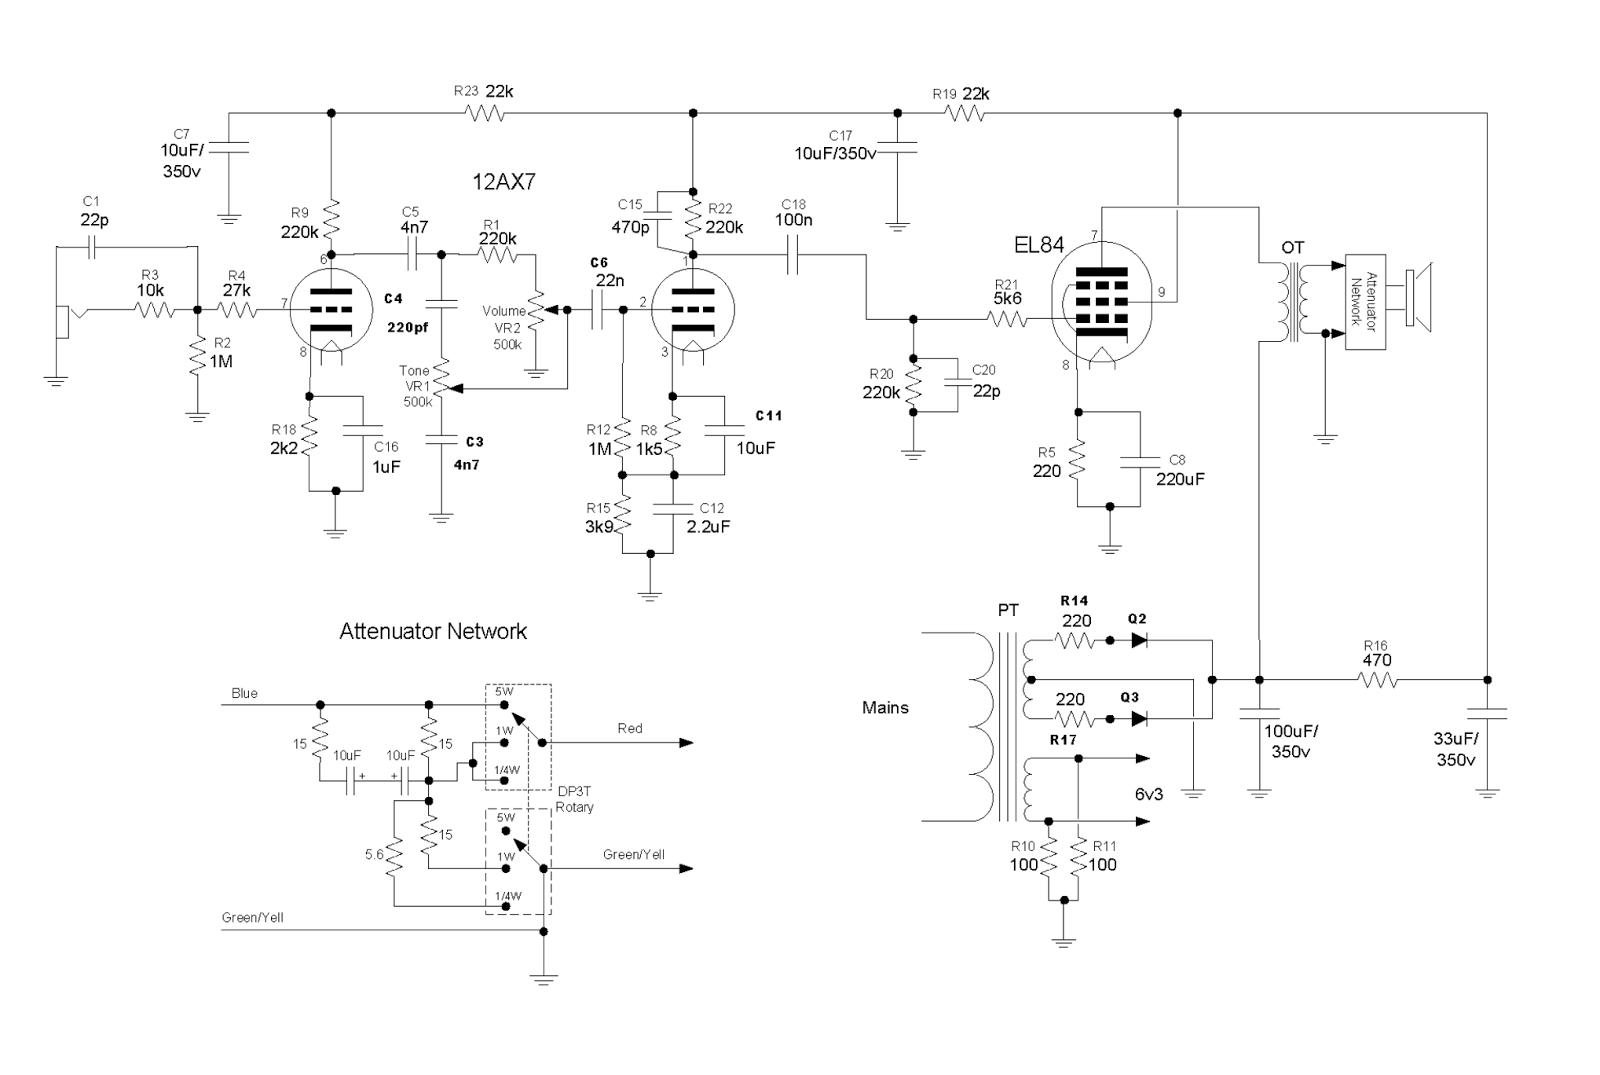 Timbre Tono Volumen: 2016 on vox tube amp mods, vox tube amp schematics, fender bassman schematic, fender champion 600 schematic, fender deluxe reverb schematic, vox ac15 layout, audio amplifier schematic, ac30 schematic, vox v9158 15r, vox vt50 amp schematics, vox vt 50 amps, vox amp diagram, blues jr schematic, vox tonelab le power cable diagram, small ice machine schematic, pcb schematic,